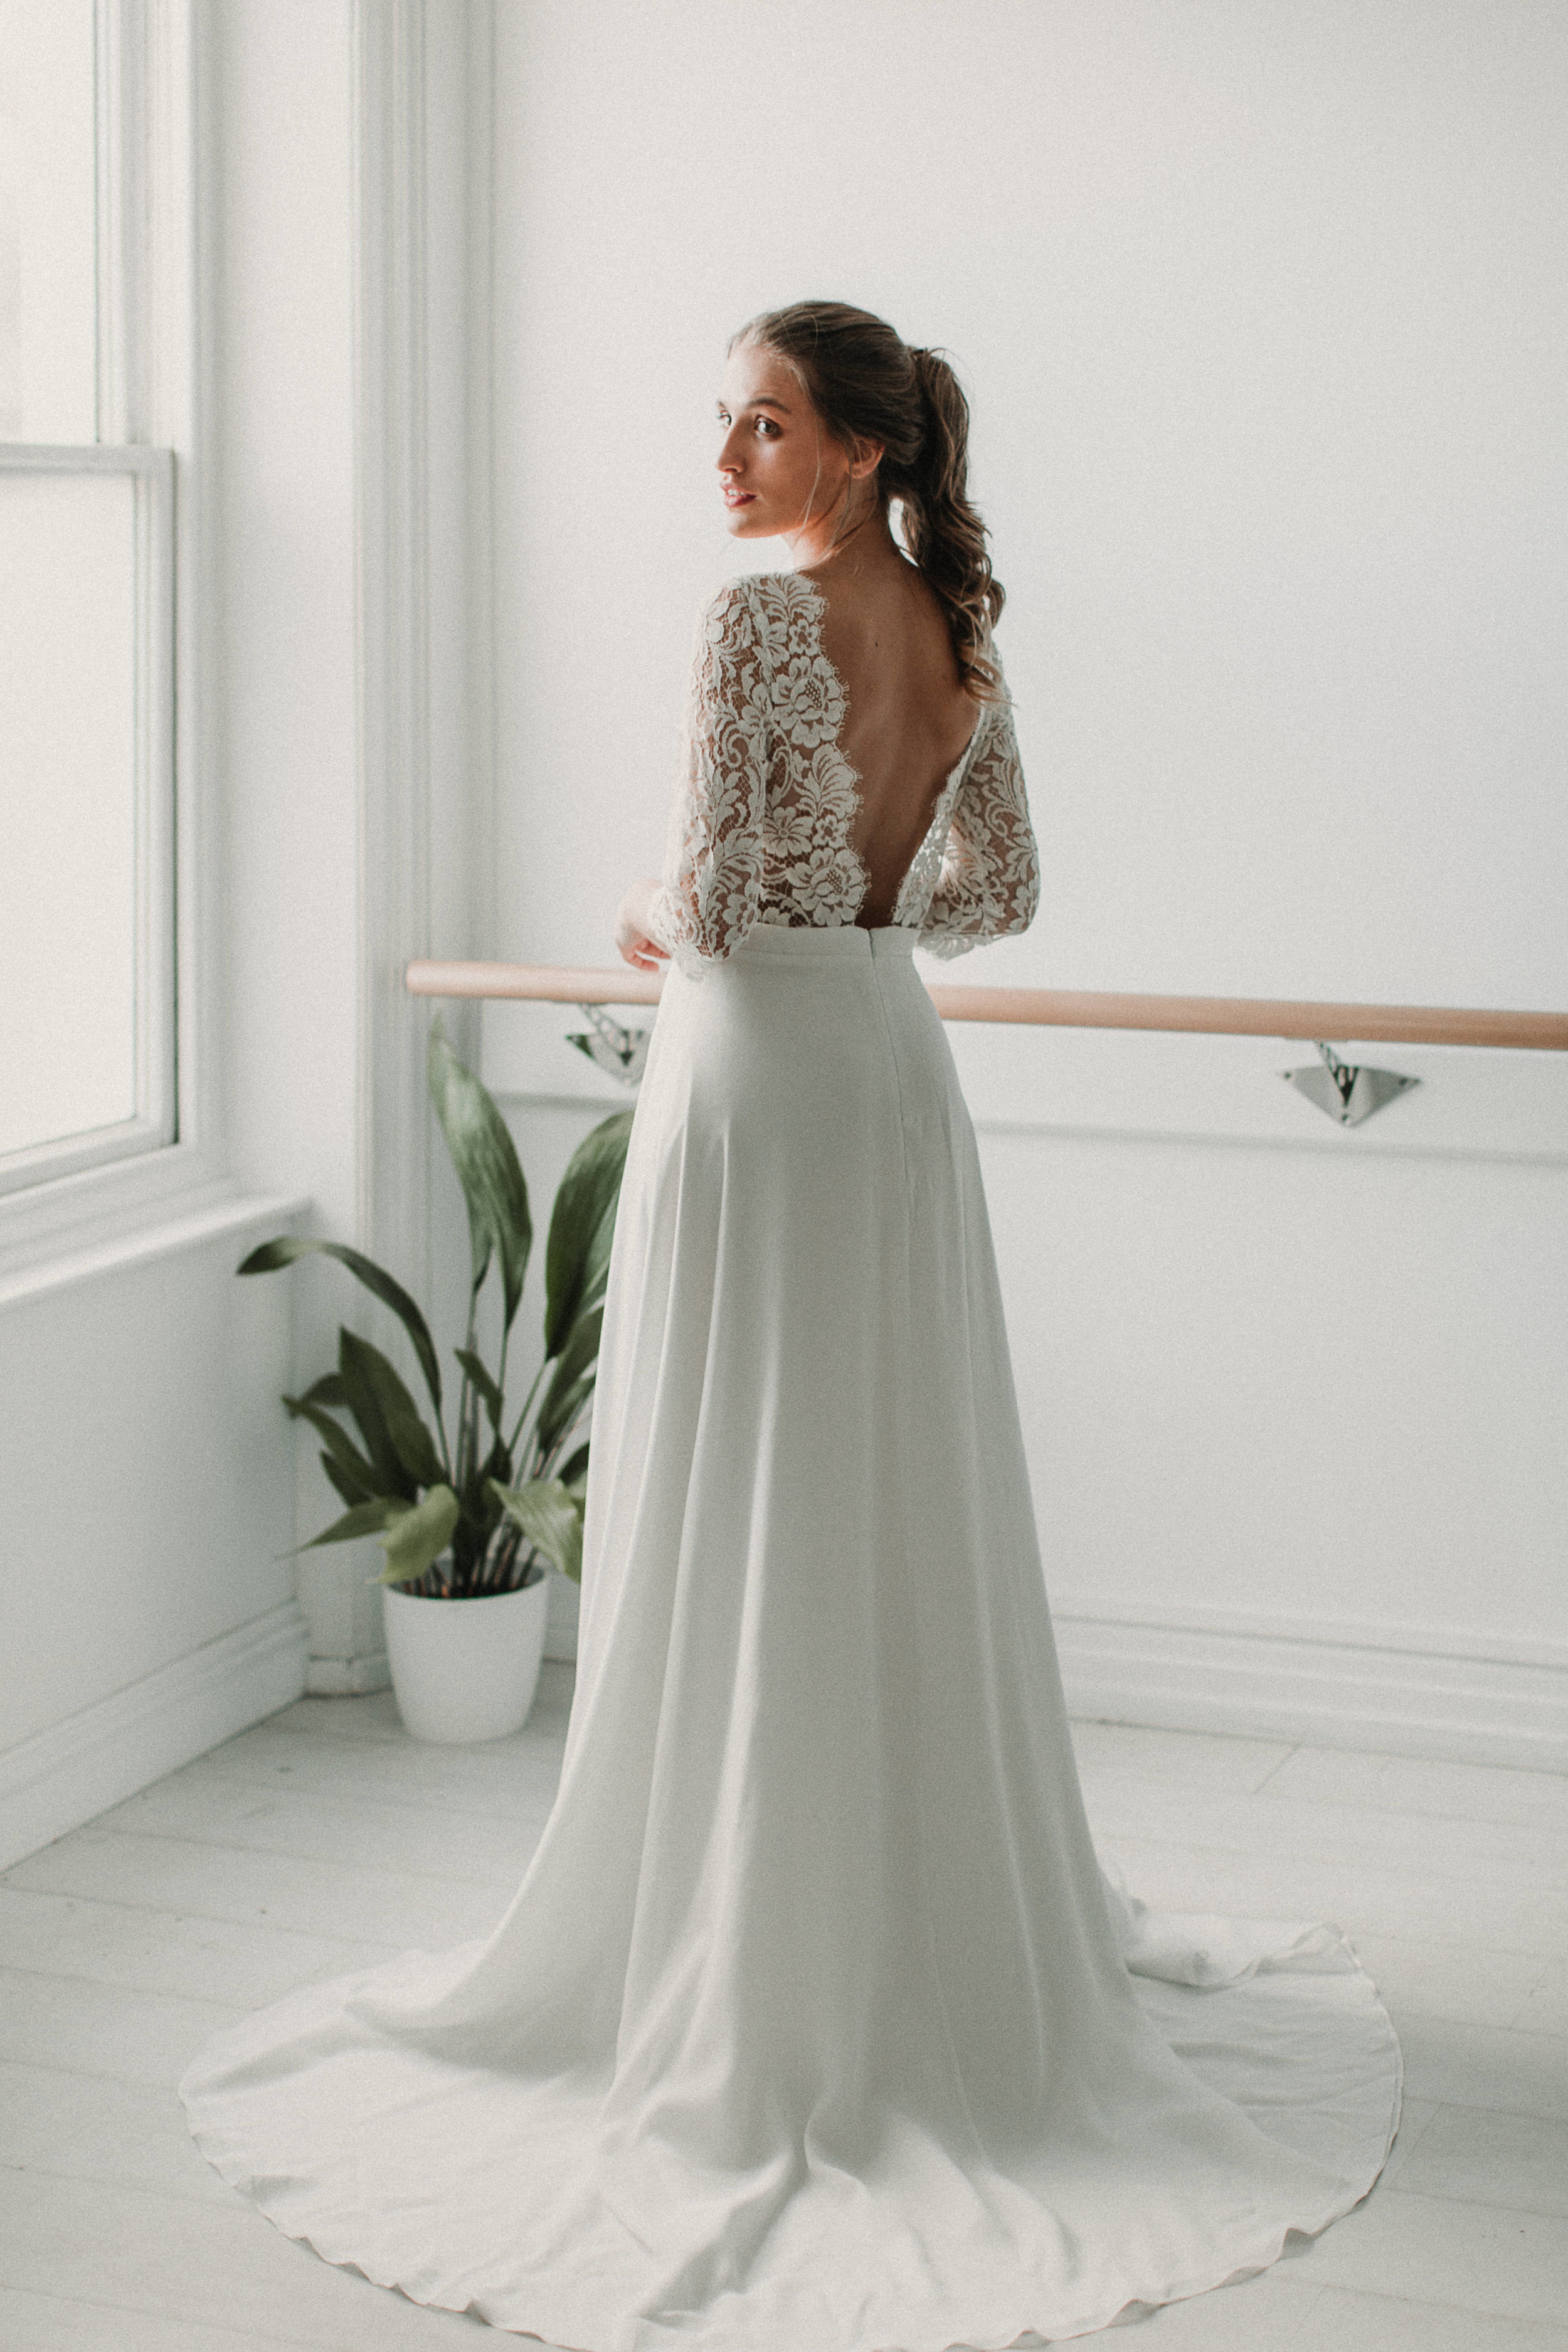 npluck_luna_bride-132.jpg